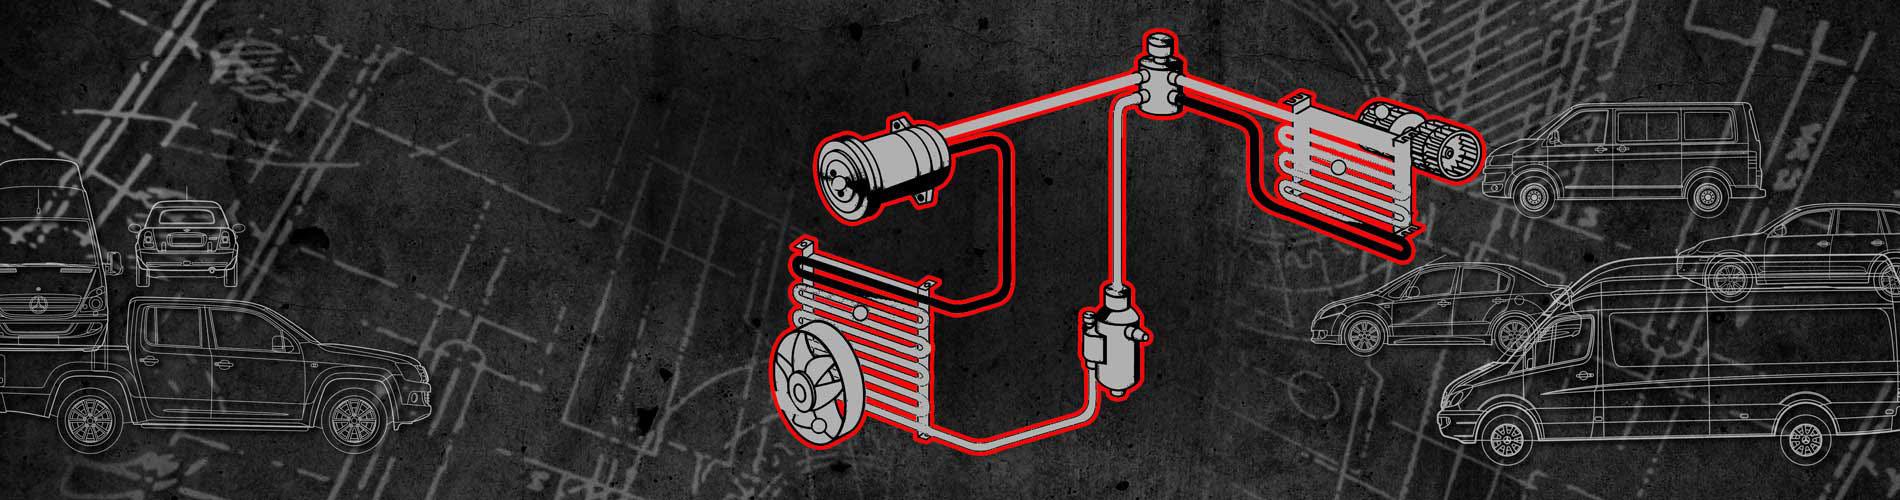 KS Tools 550.1165 Flexible UV-Inspektions-Stablampe 450mm